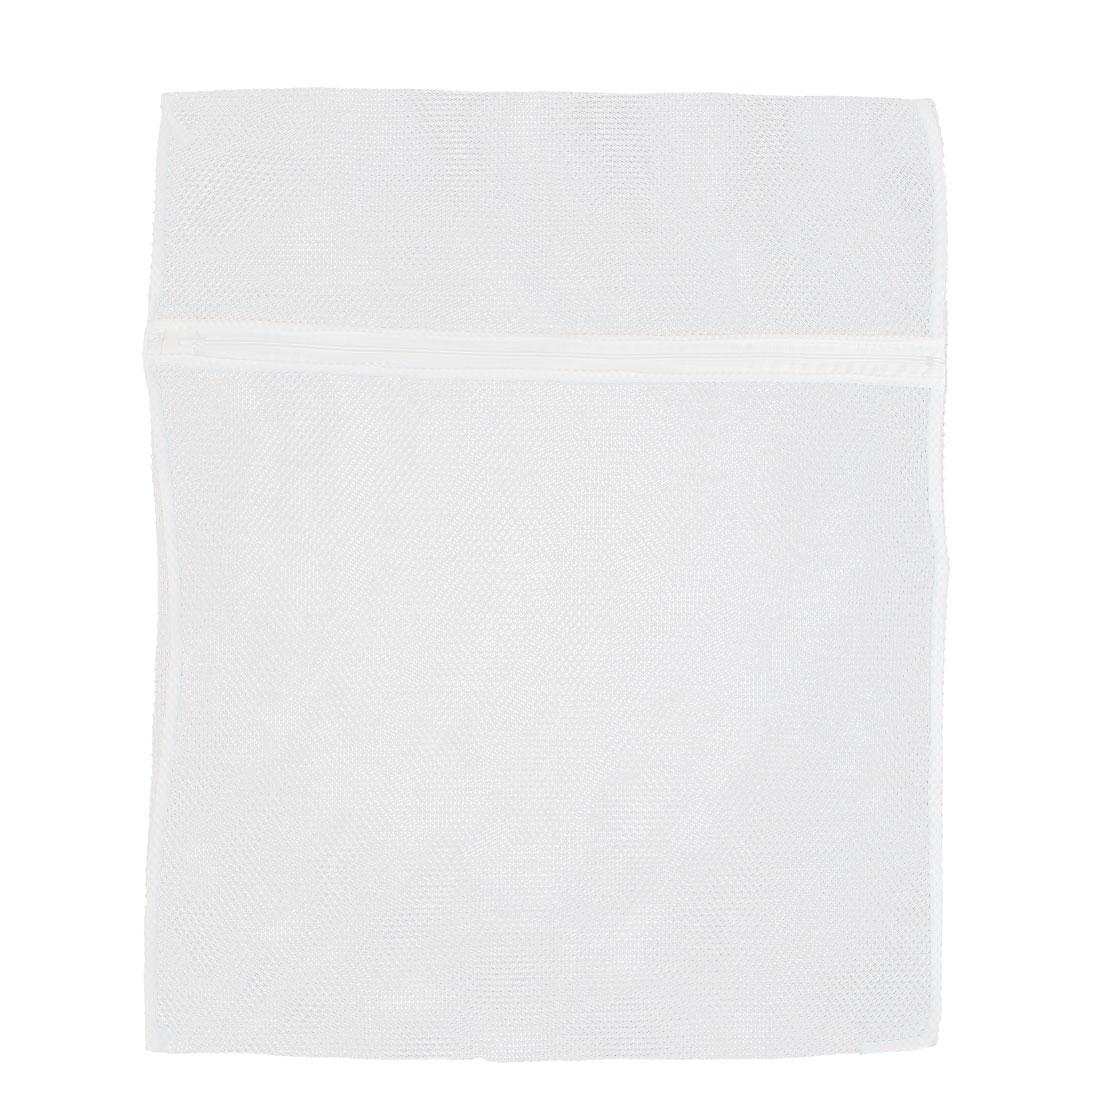 White Nylon Underwear Lingerie Cap Clothes Wash Washing Bag 60 x 48cm